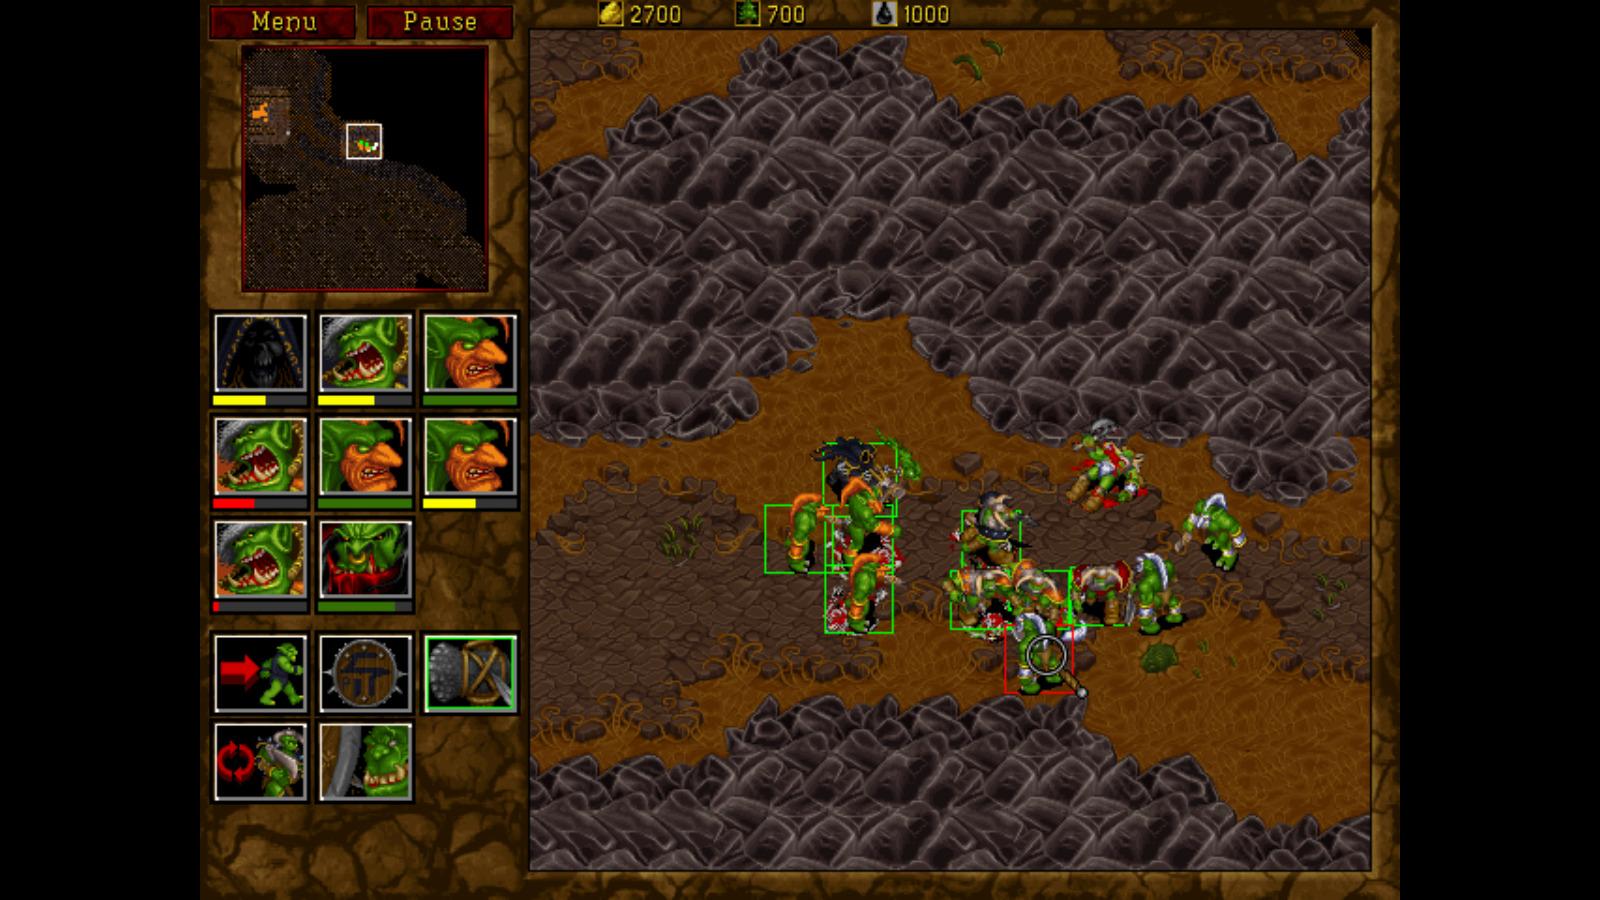 3rd-strike com   Warcraft Orcs & Humans + Warcraft II Battle